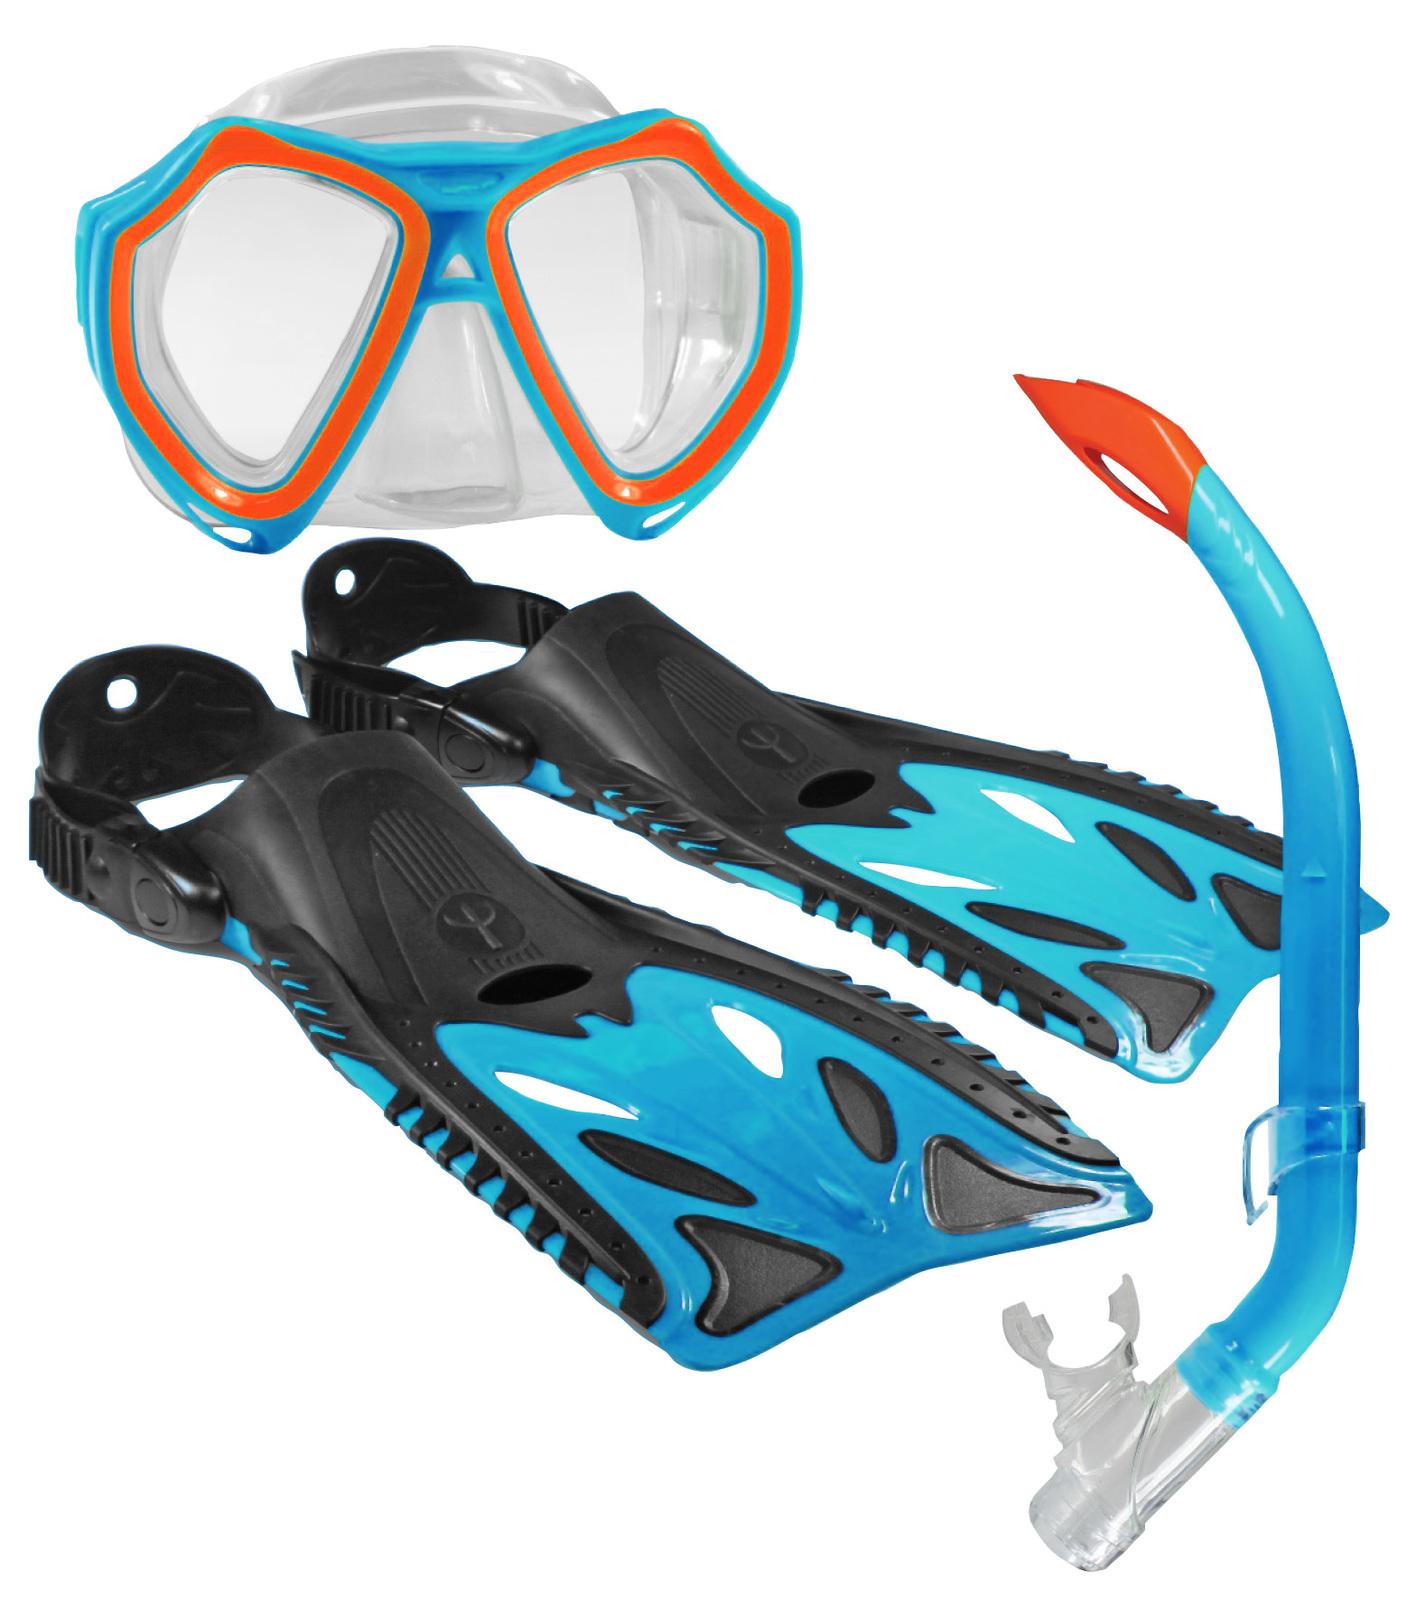 Land & Sea Nipper Mask/Snorkel/Fin Set - Child Size 1-4 (Blue/Black/Orange) image